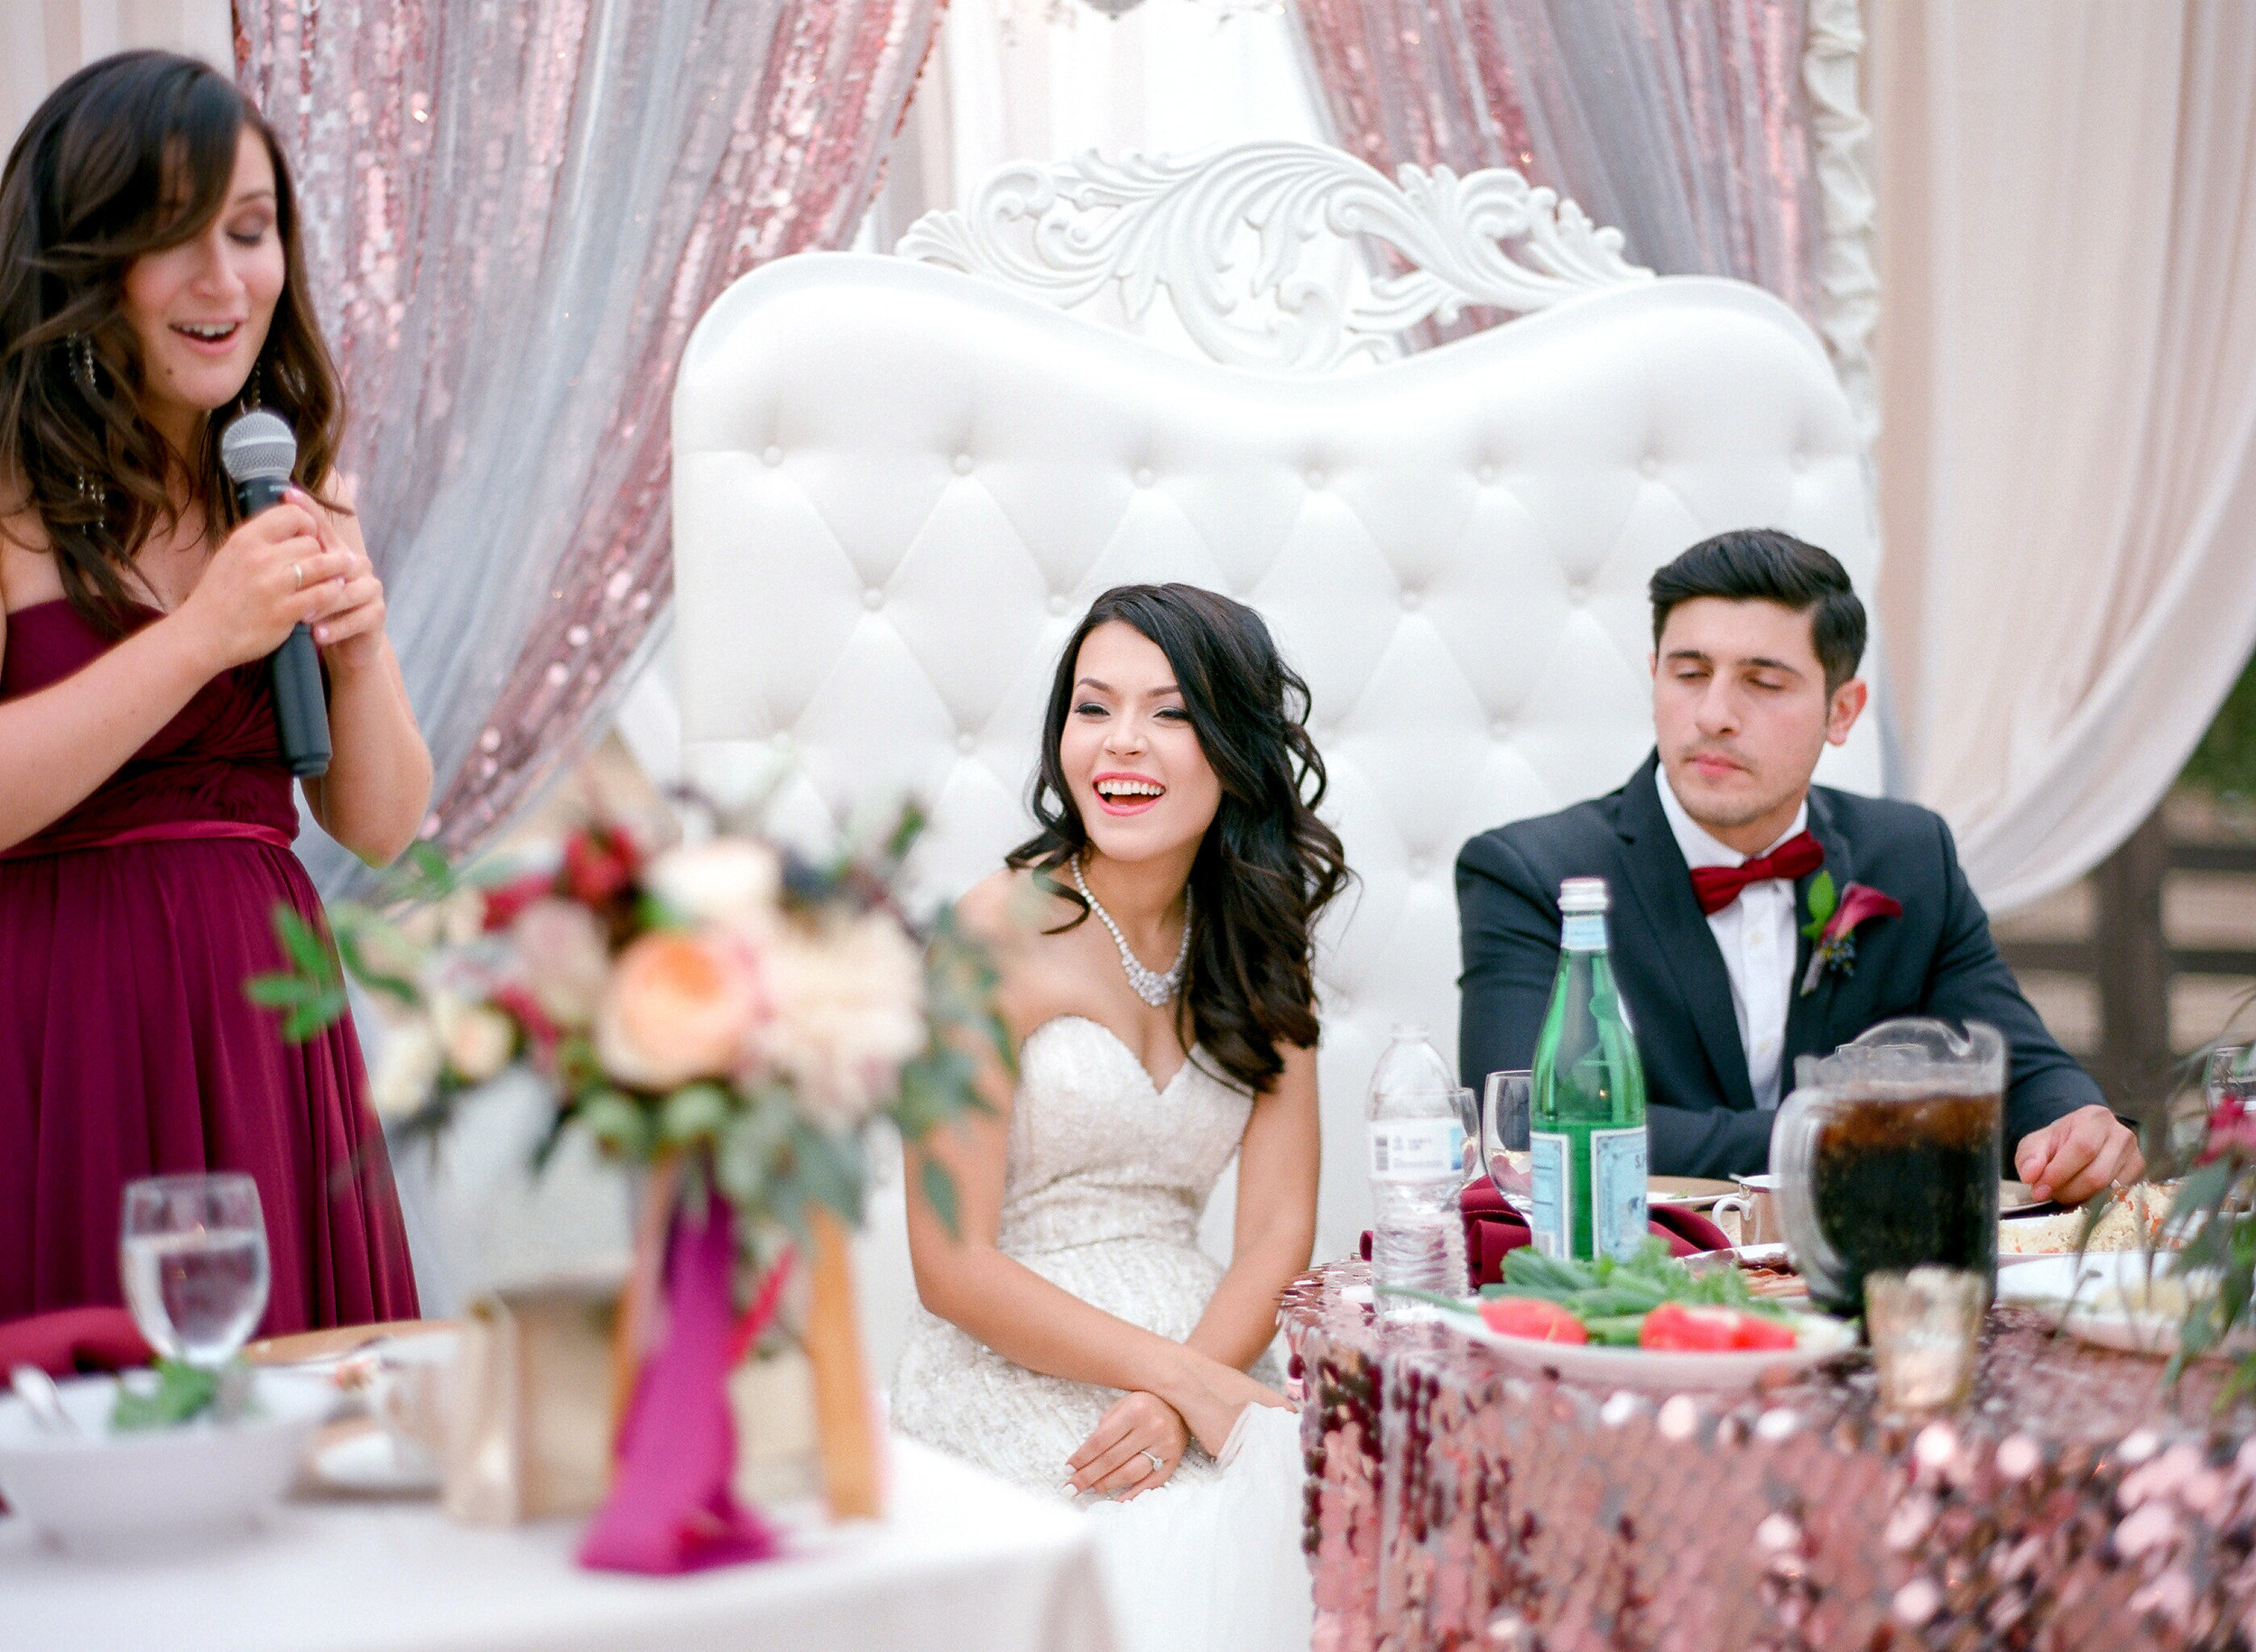 Amador_County_Wedding_Bride_Groom_Reception_Sweetheart_Table_Rancho_Victoria_Vineyard_Northern_California.jpg